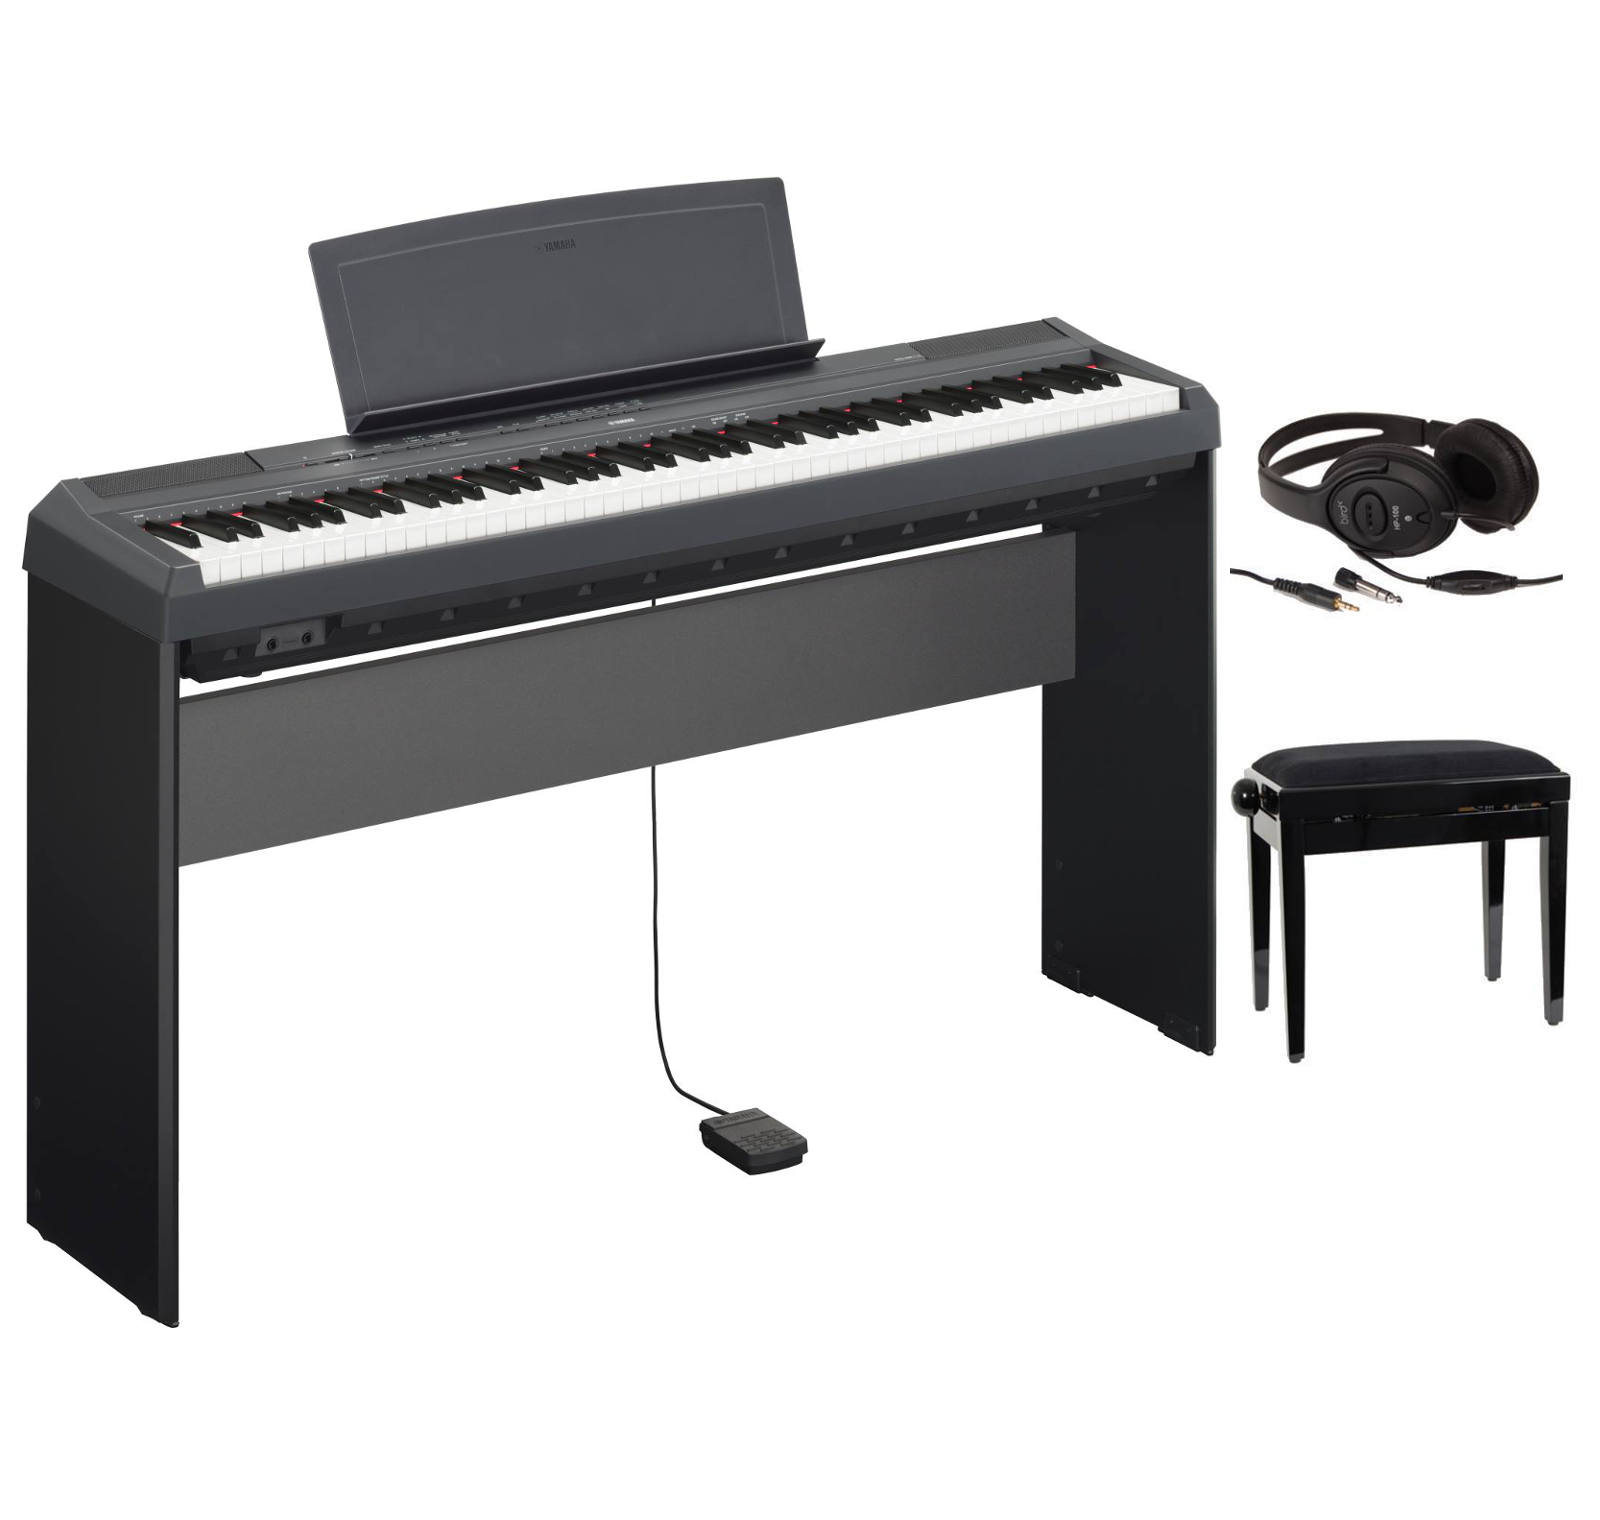 yamaha p115b piano num rique noir piano buy online free. Black Bedroom Furniture Sets. Home Design Ideas